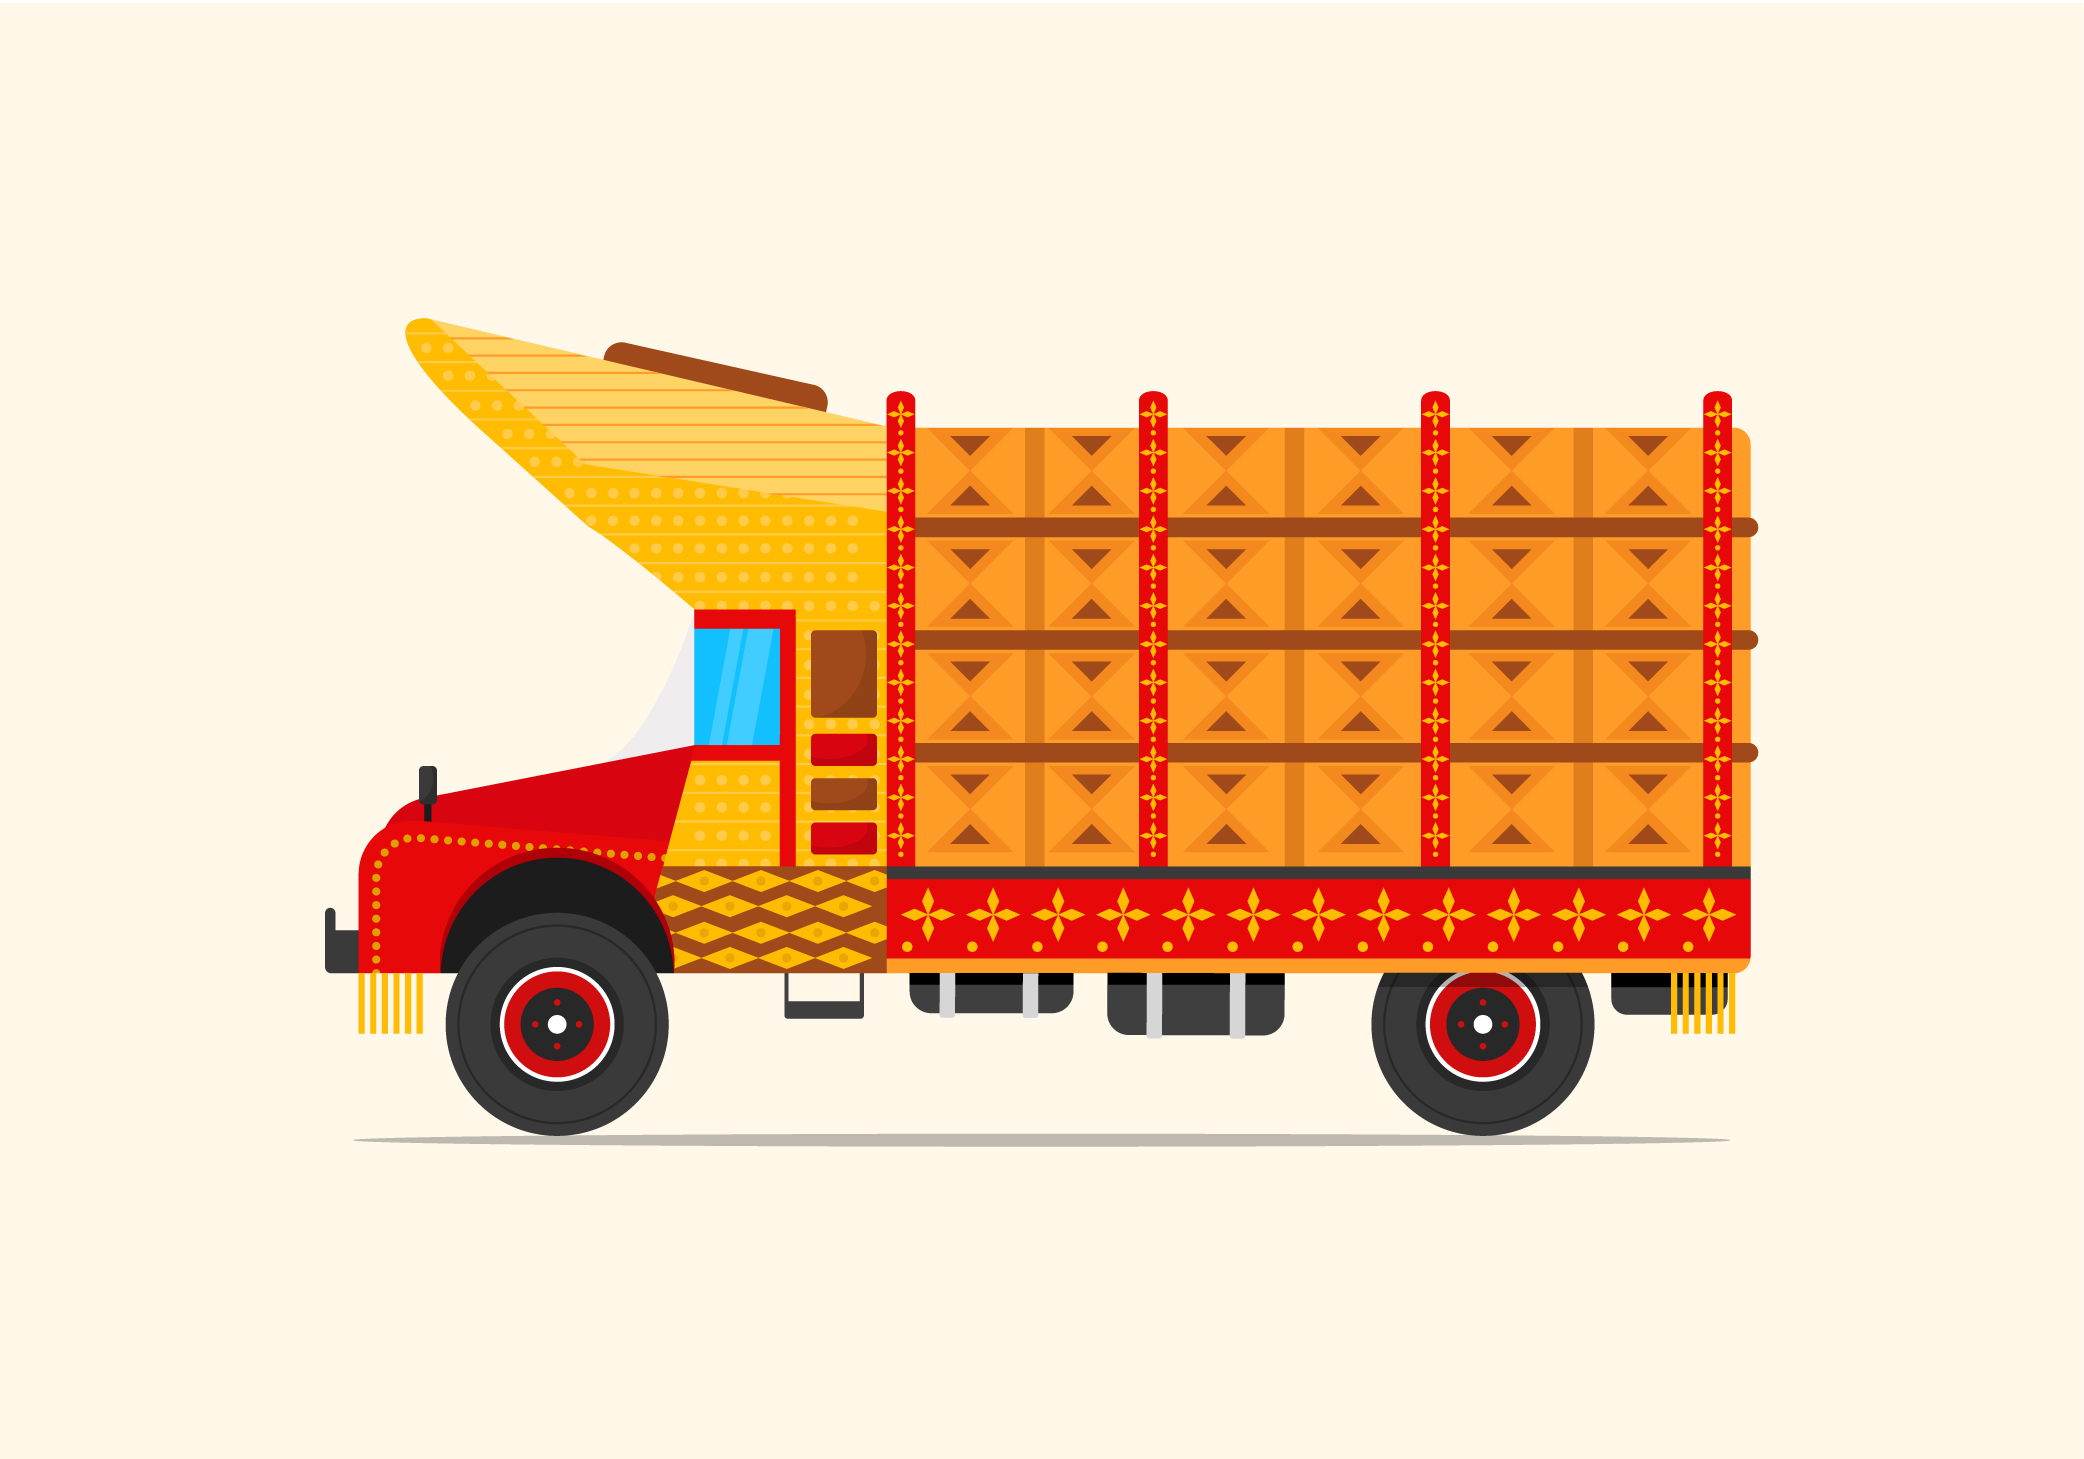 Retro Truck Image Vector